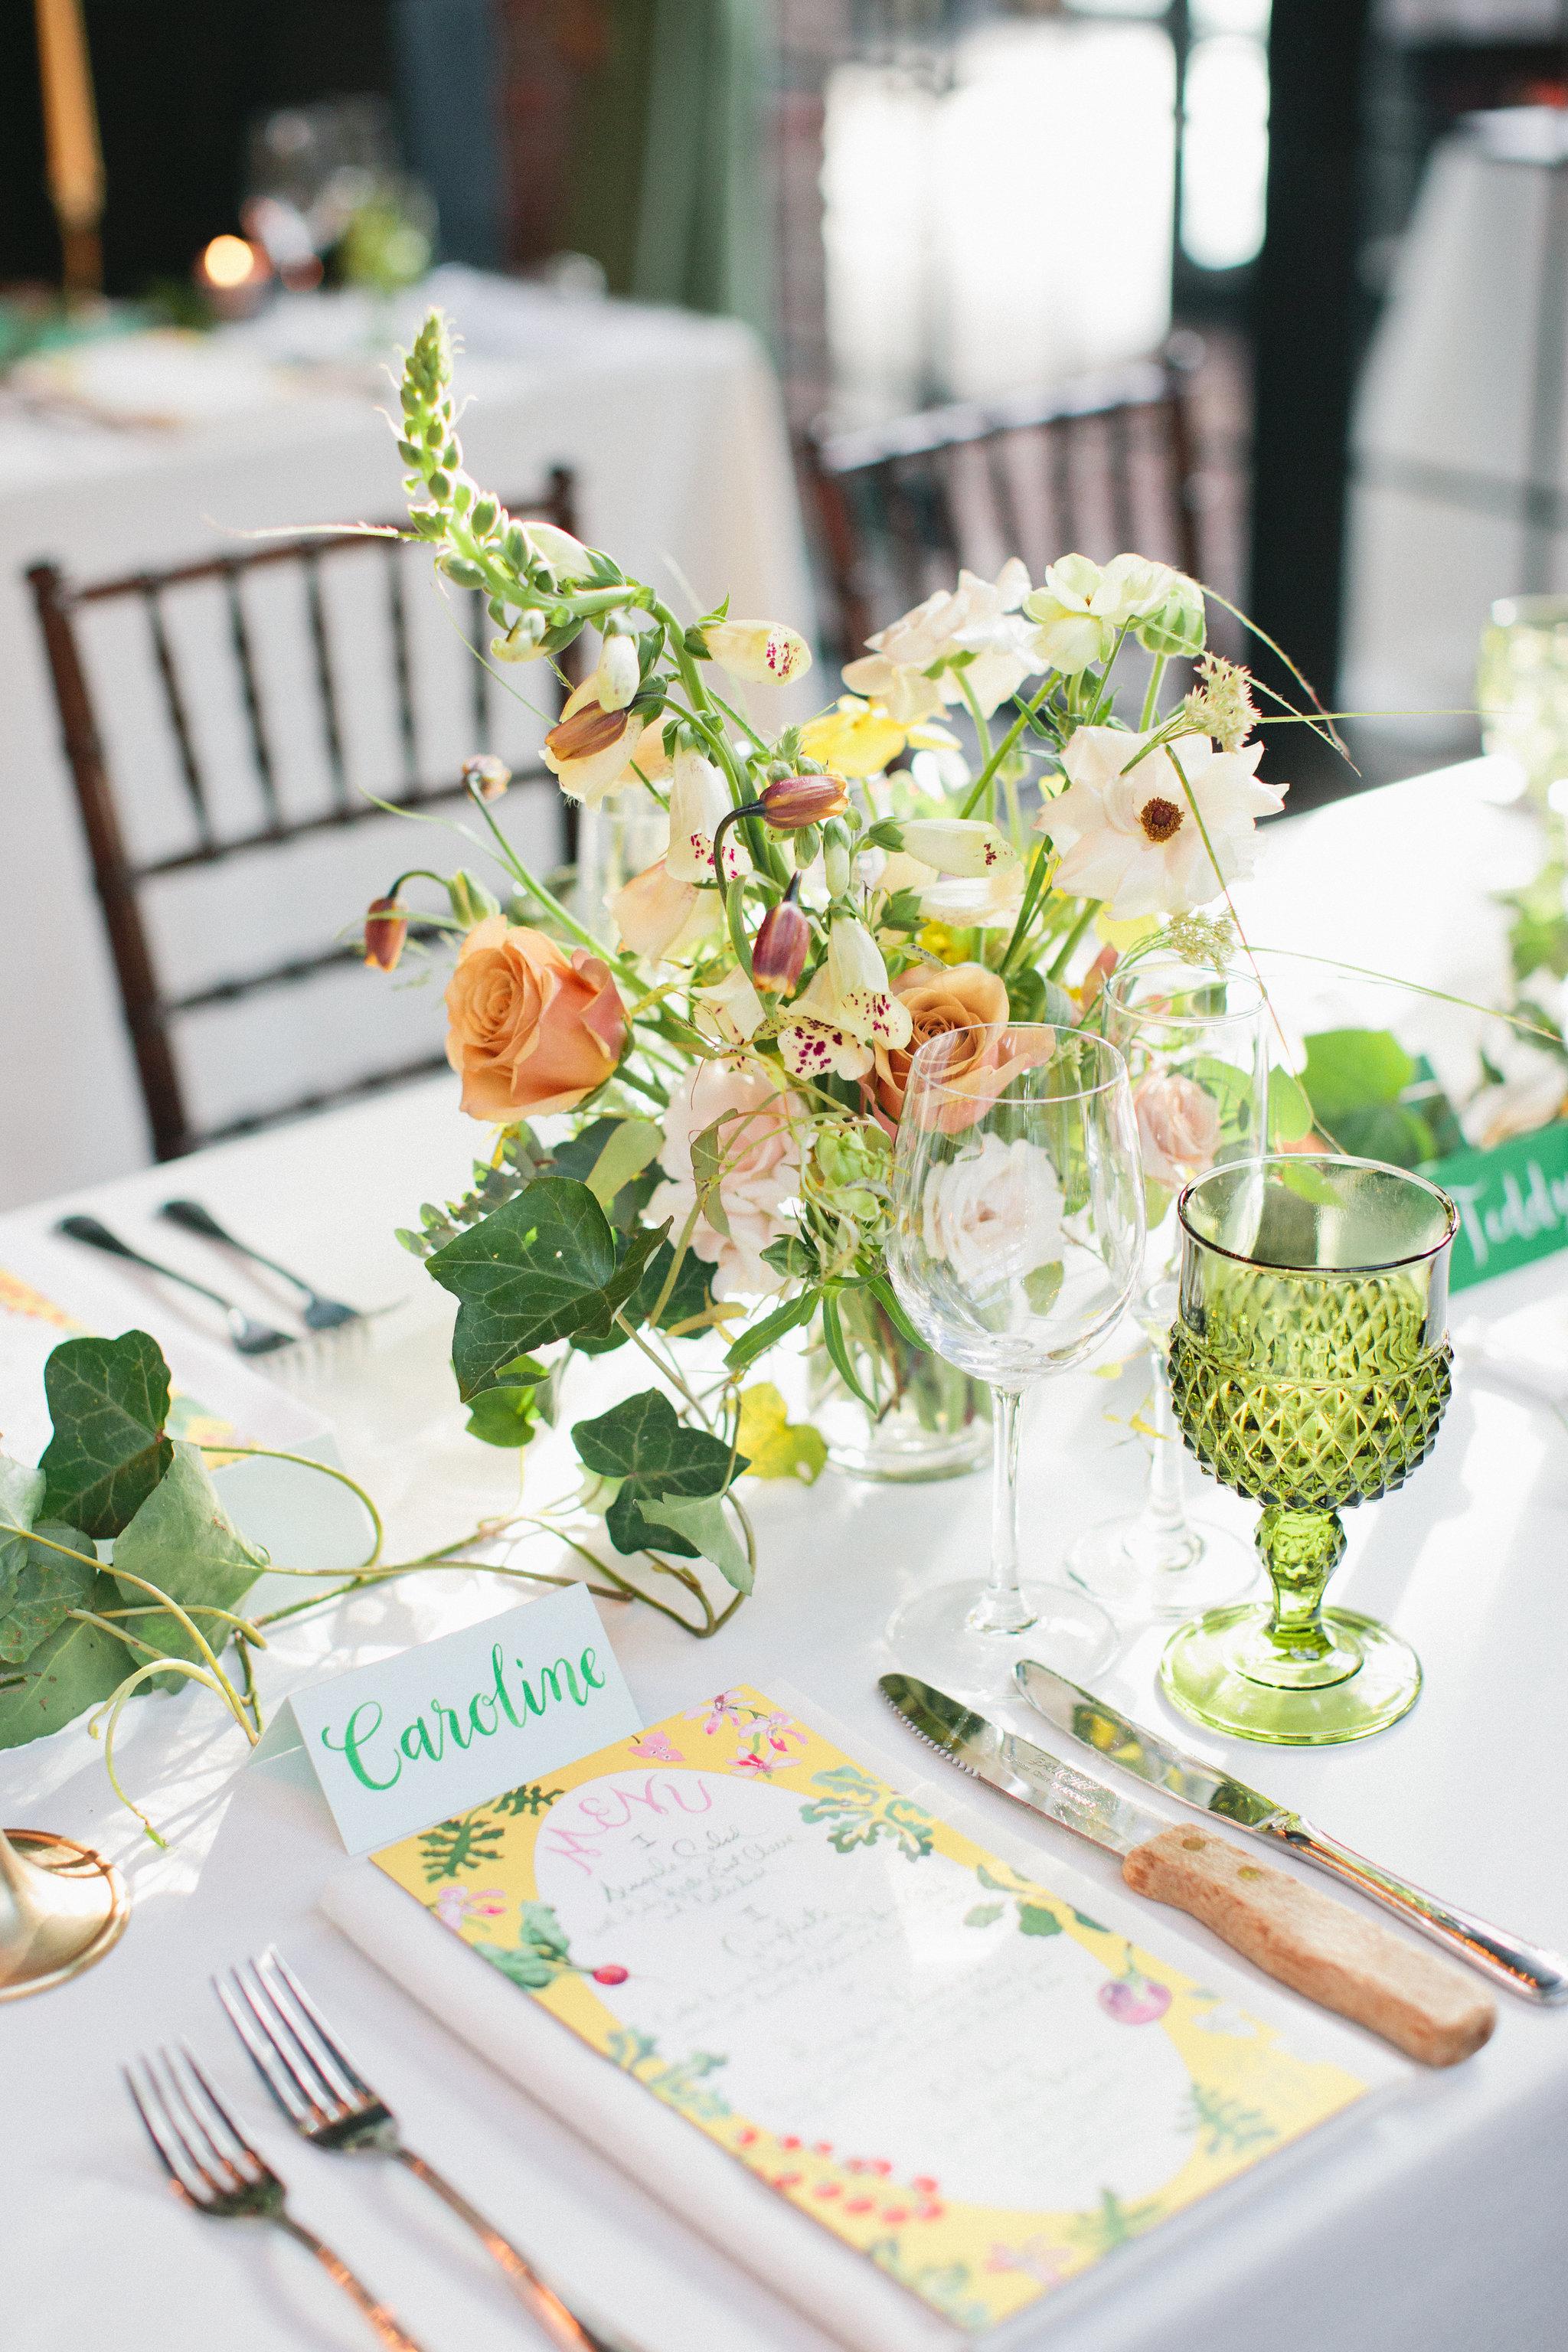 bowery-hotel-wedding-jove-meyer-events-030.jpg